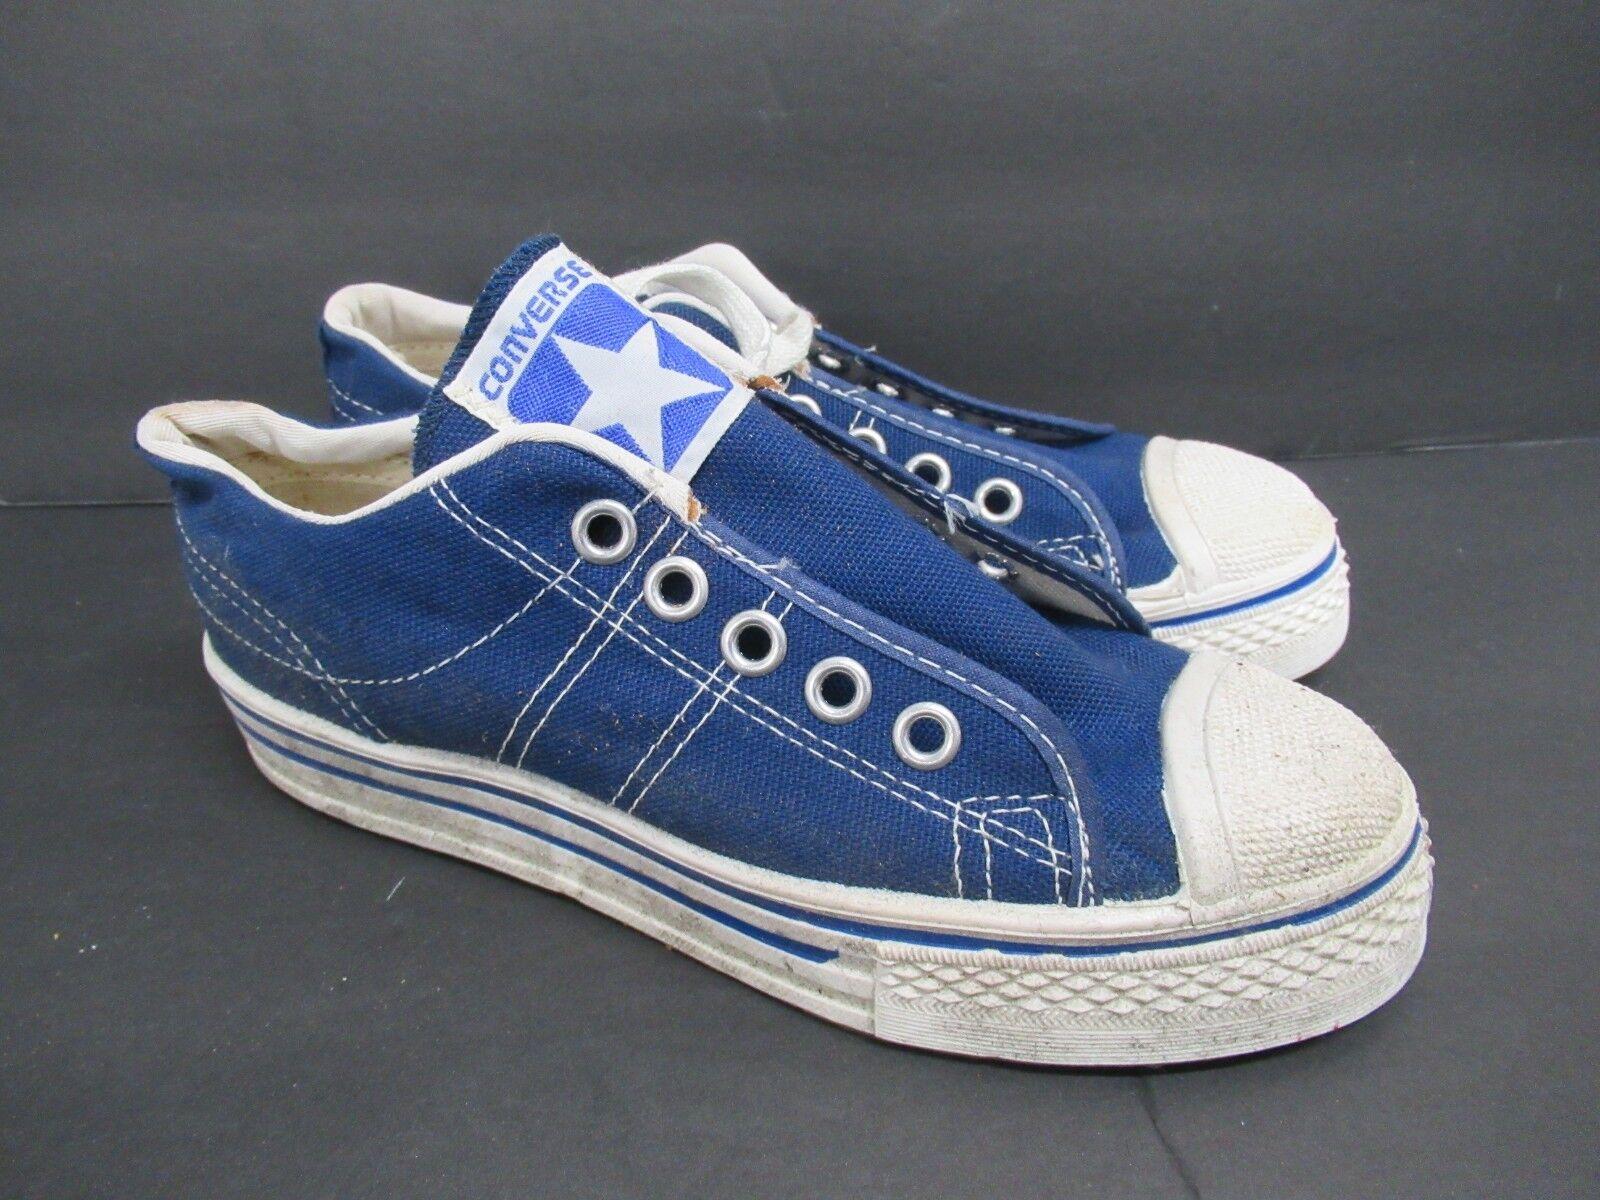 Vintage Retro Converse Blau in Blau Converse Canvas Schuhes 60s/70s Kids' Größe: 13.5 f6d2a9